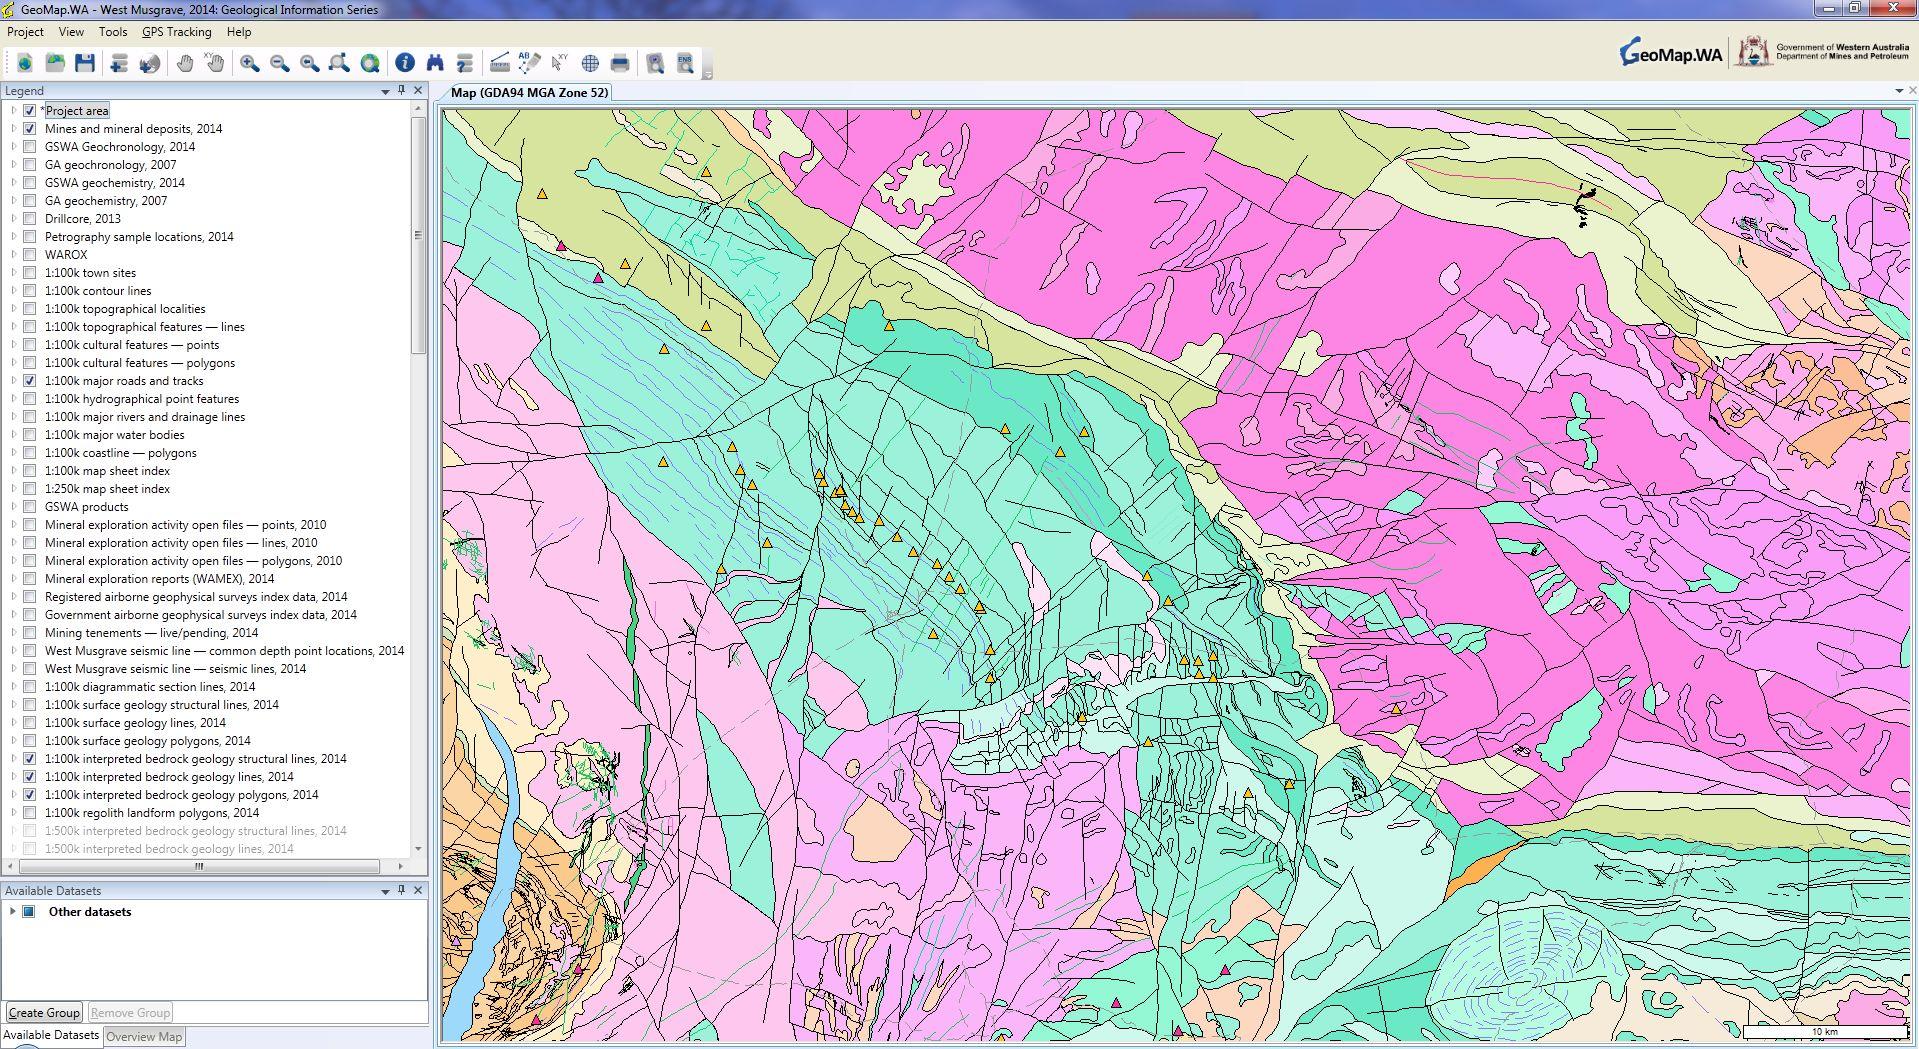 GIS viewer for Windows (GeoMap.WA)